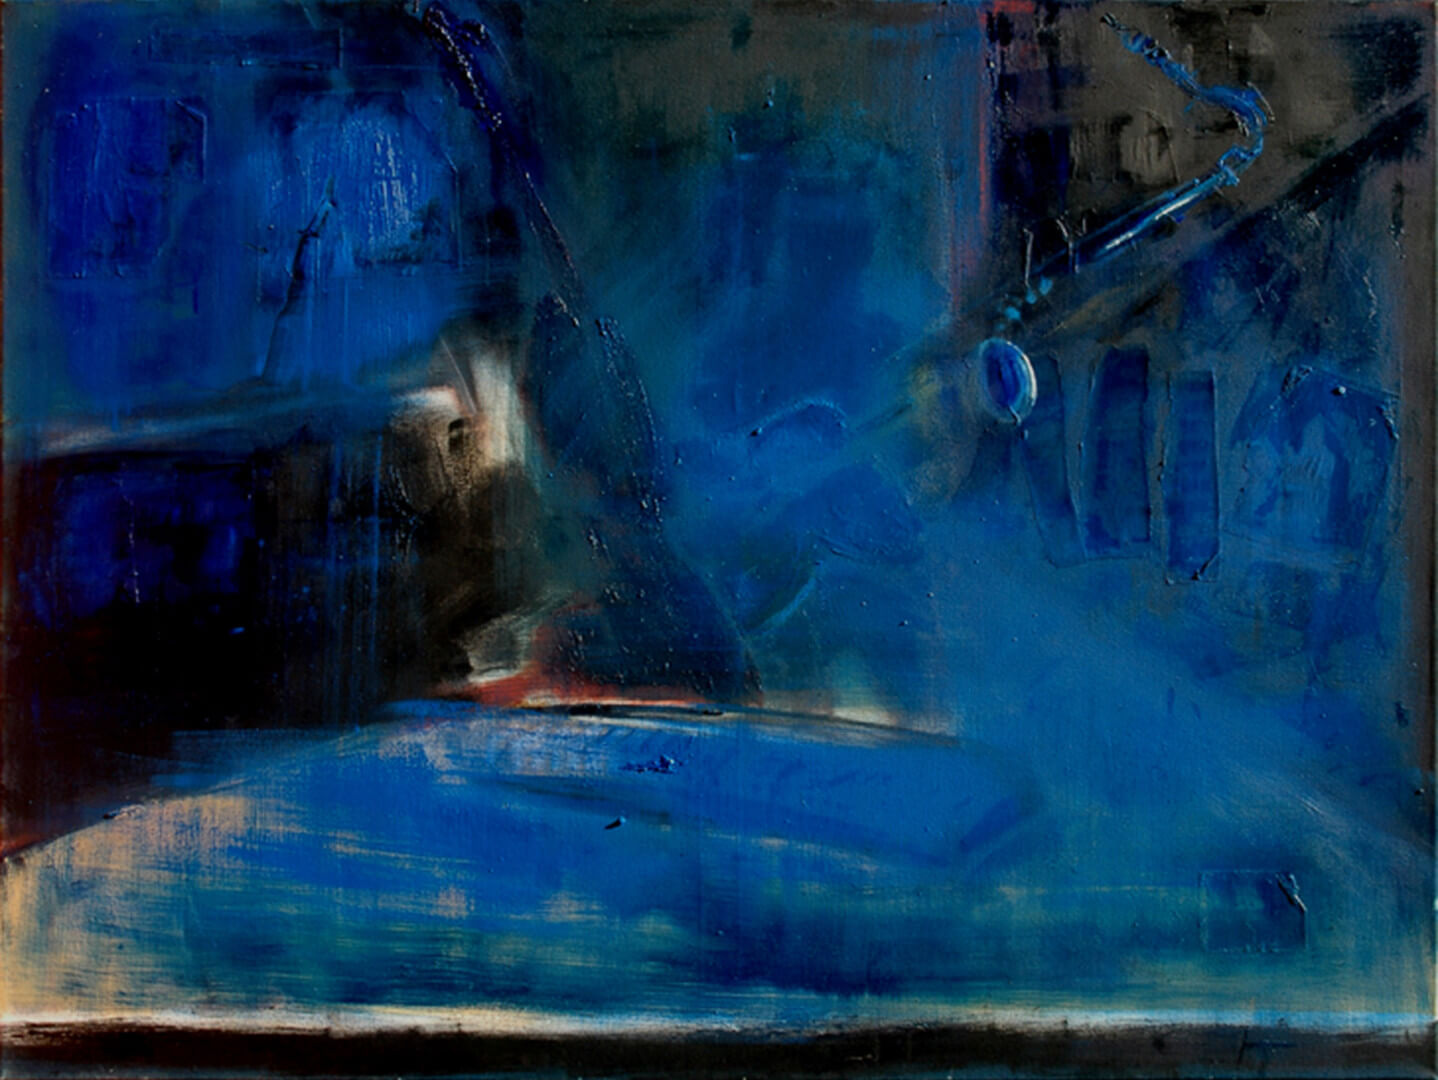 2004 - Oil on canvas. 120 cm. x 160 cm.